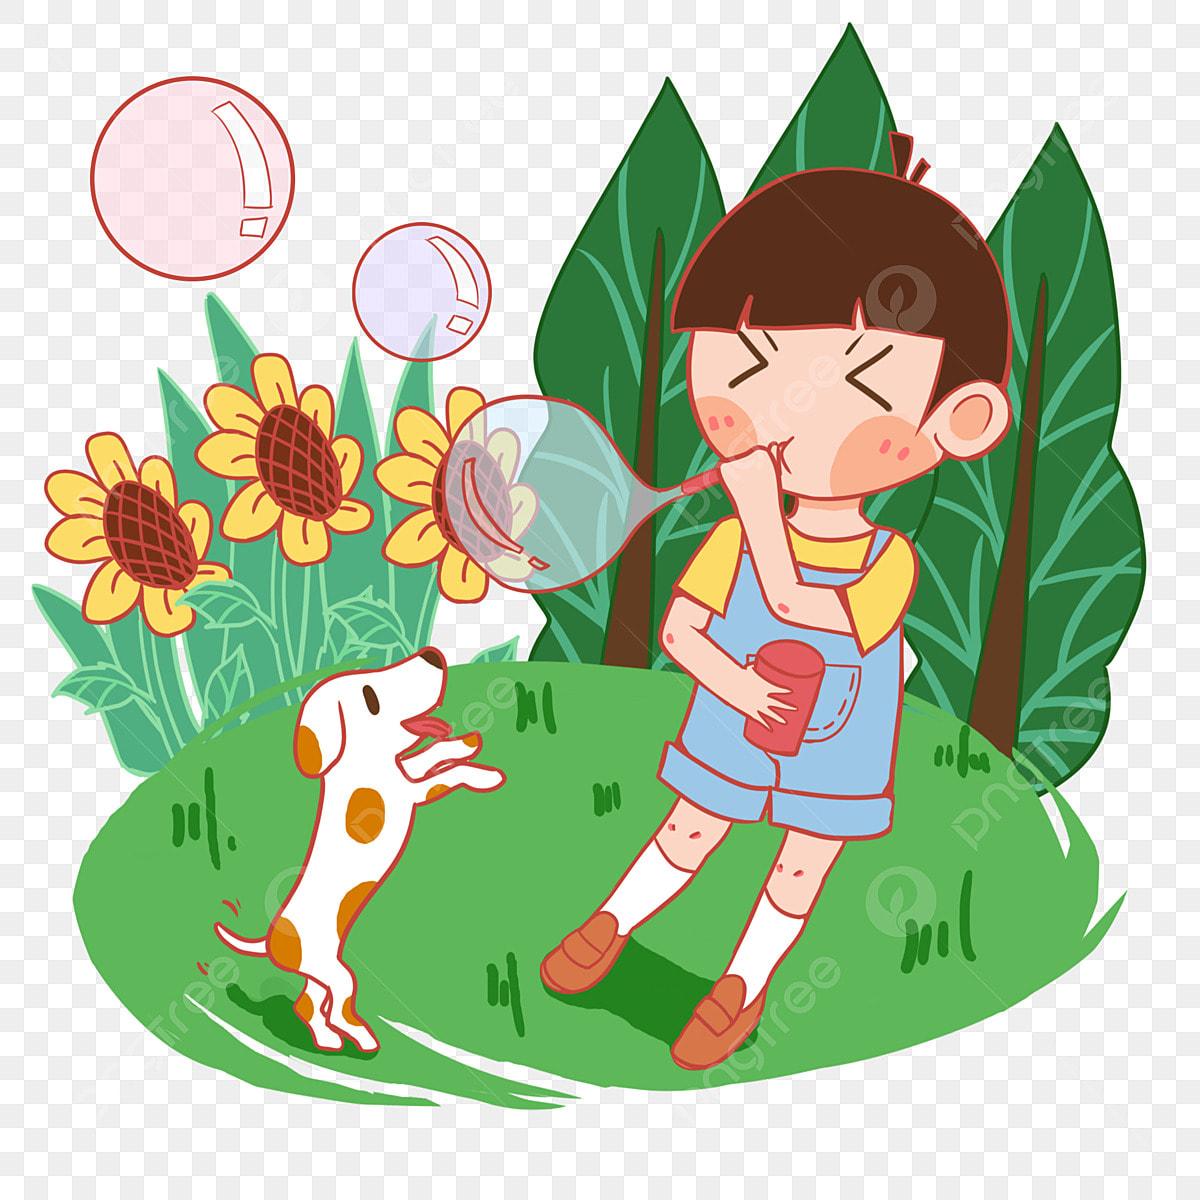 Keren 30 Gambar Kartun Taman Bermain Anak - Gambar Kartun Mu